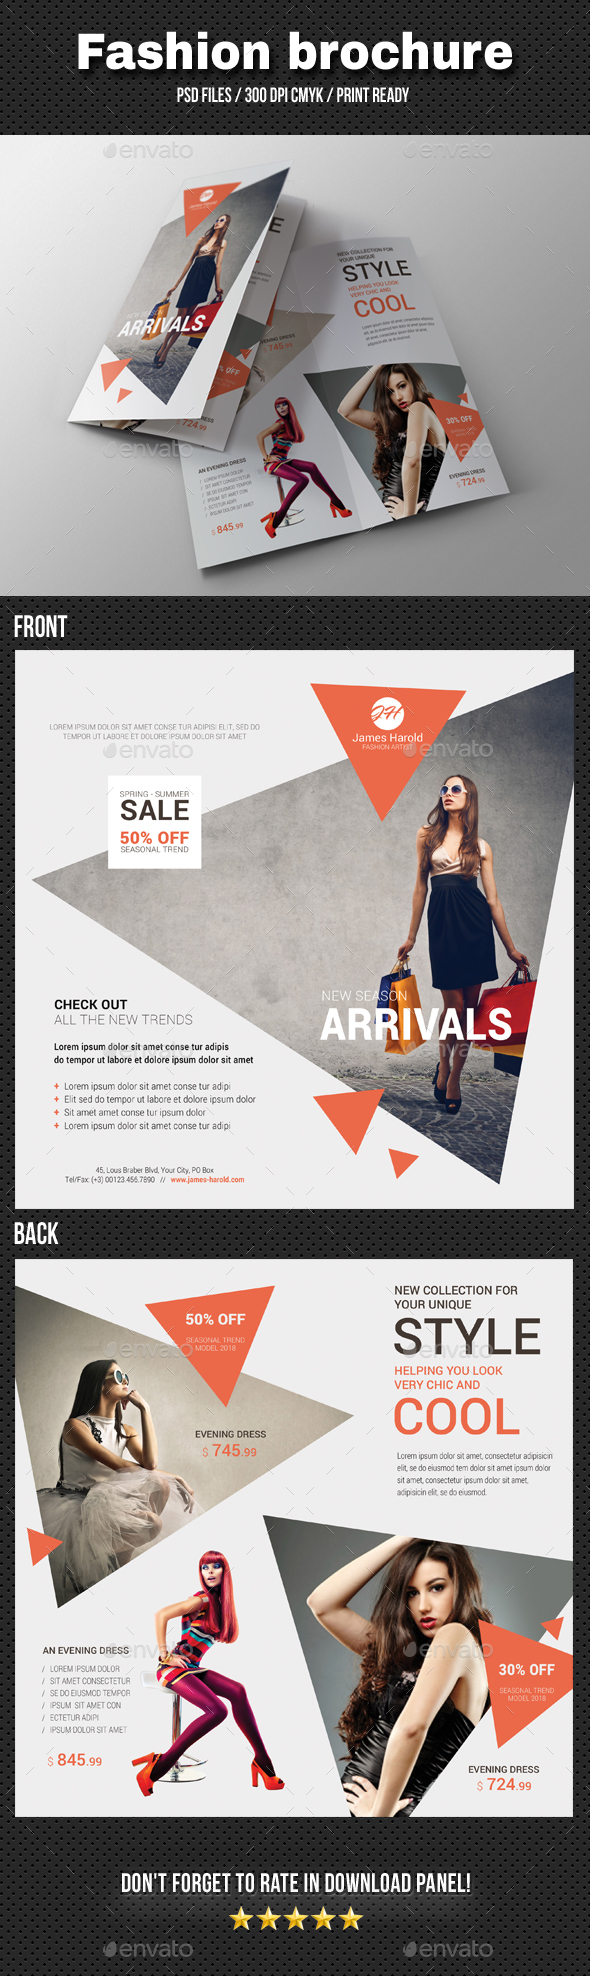 Fashion Bi-Fold Brochure 04 - Catalogs Brochures